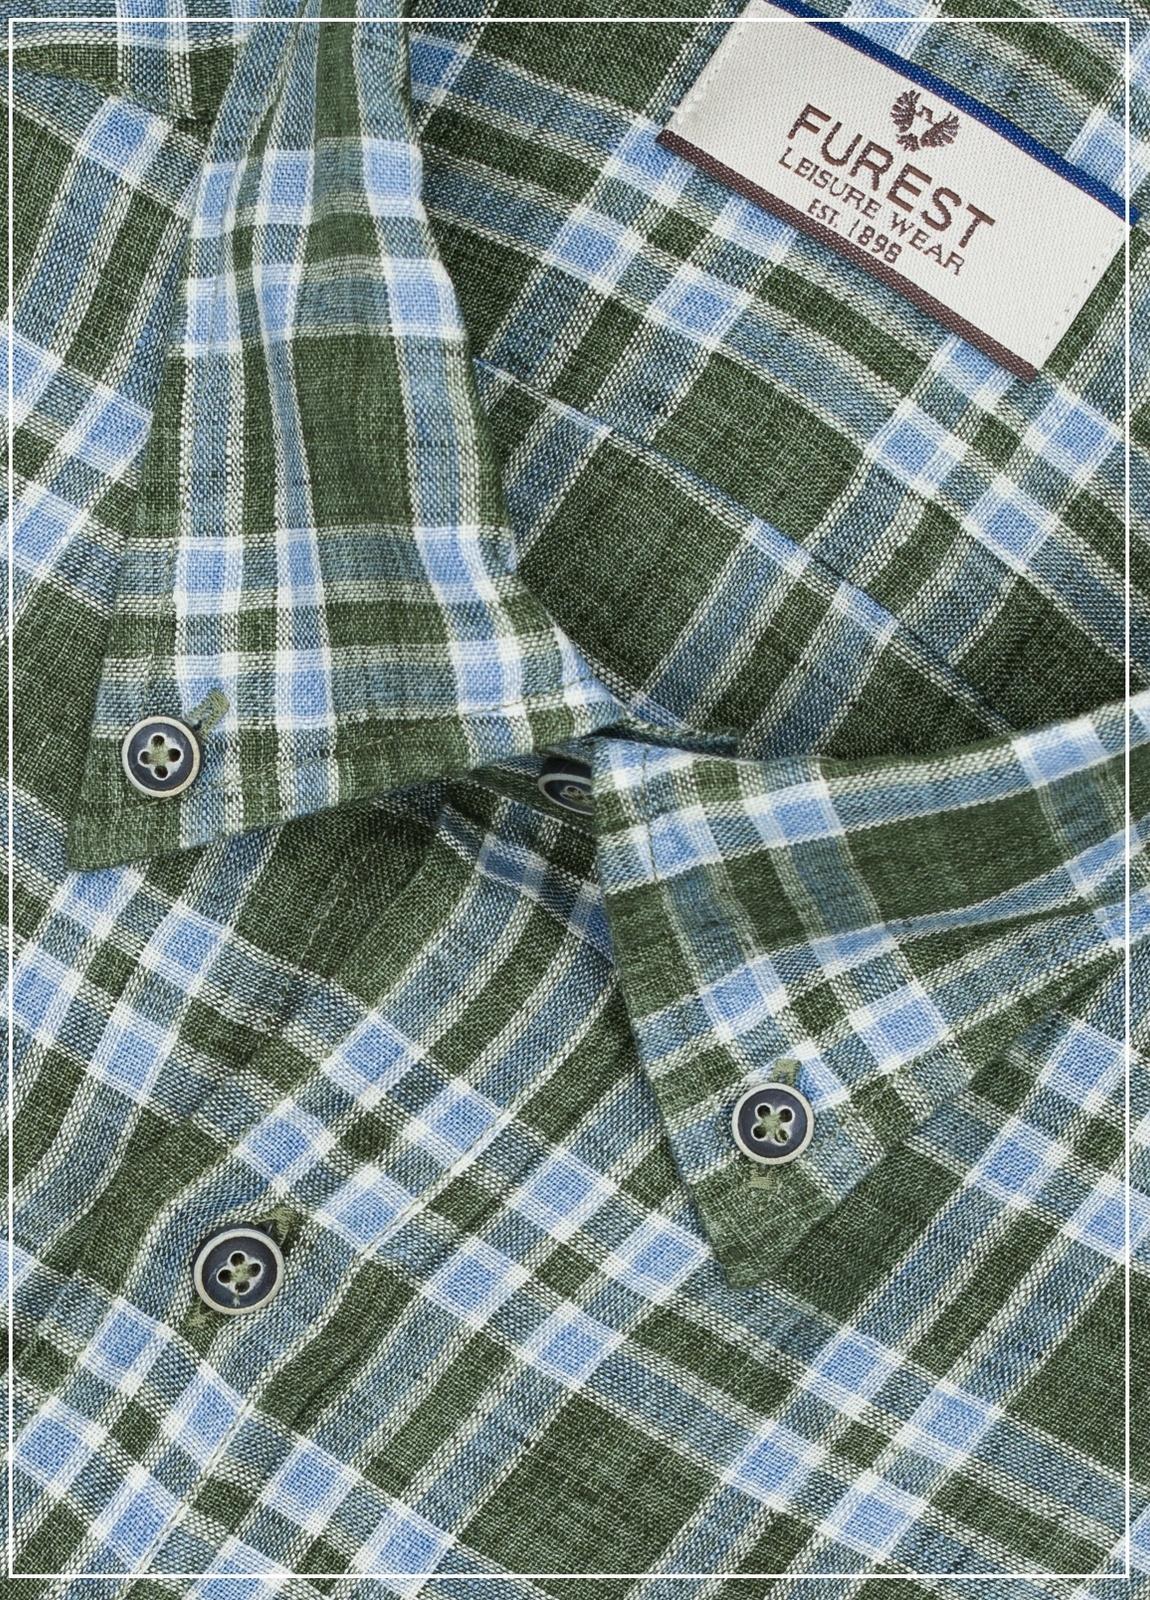 Camisa Leisure Wear REGULAR FIT Modelo BOTTON DOWN estampado cuadros verdes , 100% Lino - Ítem3